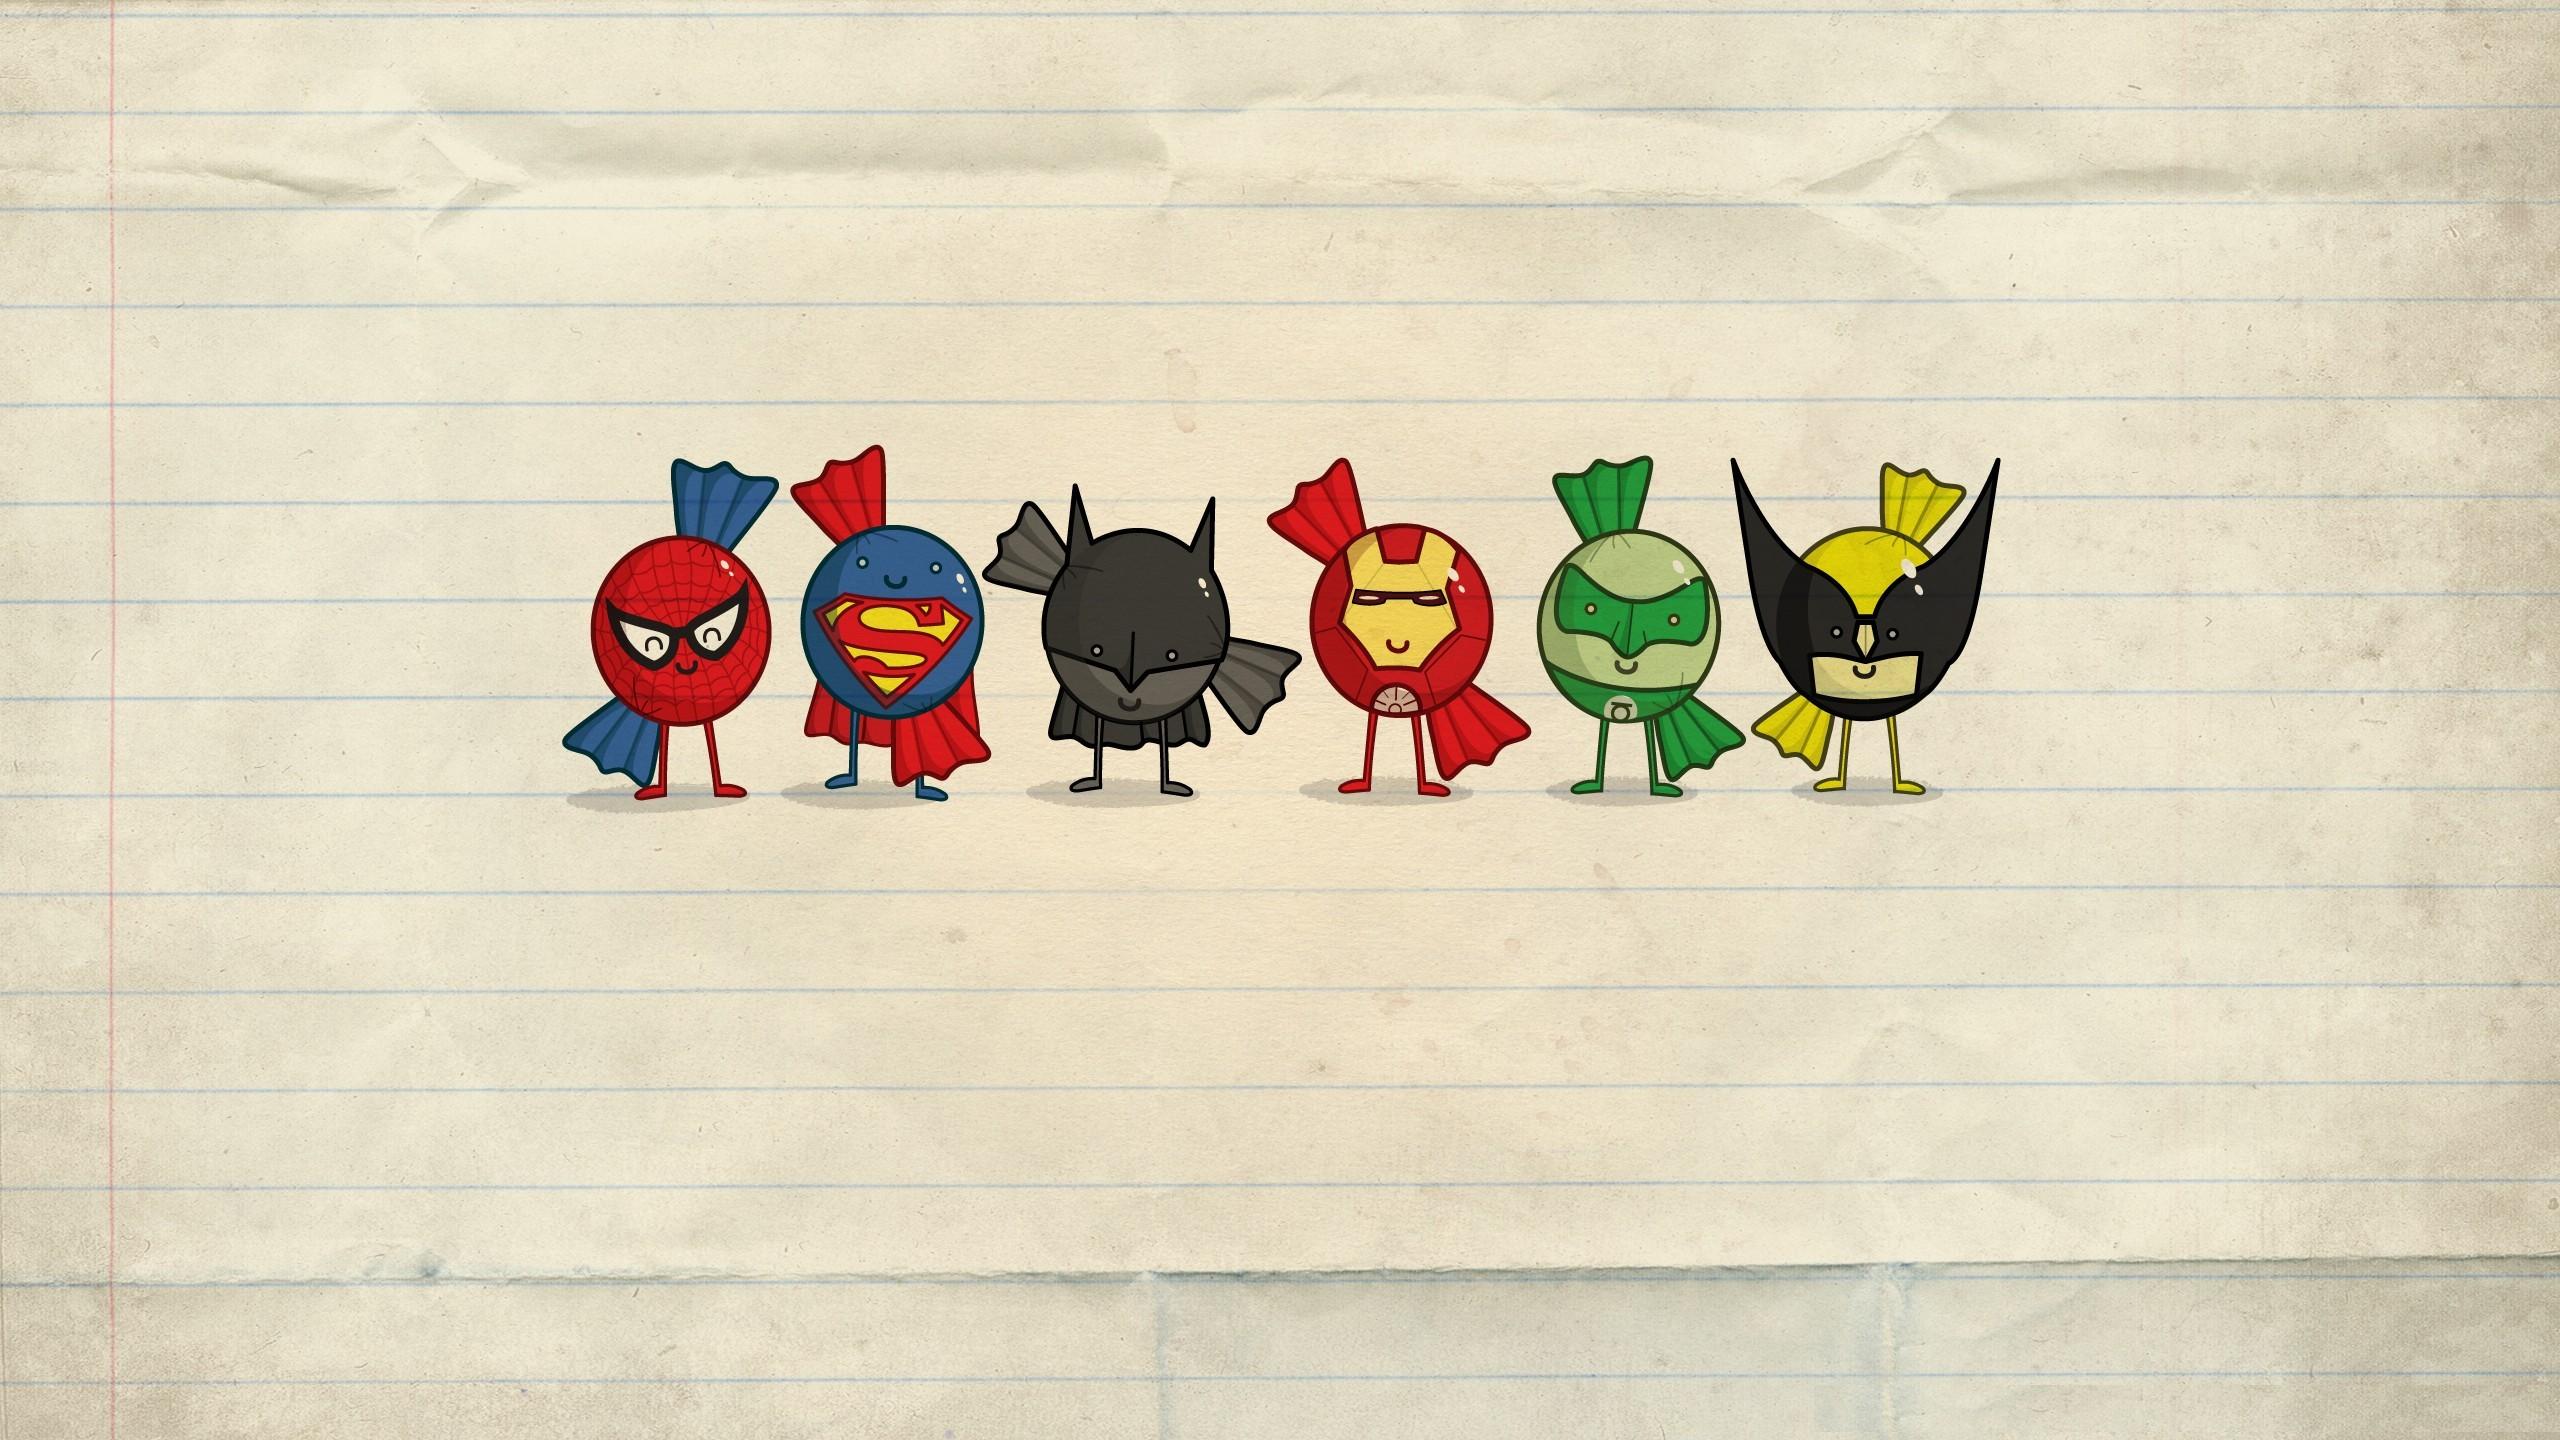 General 2560x1440 minimalism Iron Man Spider-Man Superman Batman superhero cartoon Green Lantern Wolverine